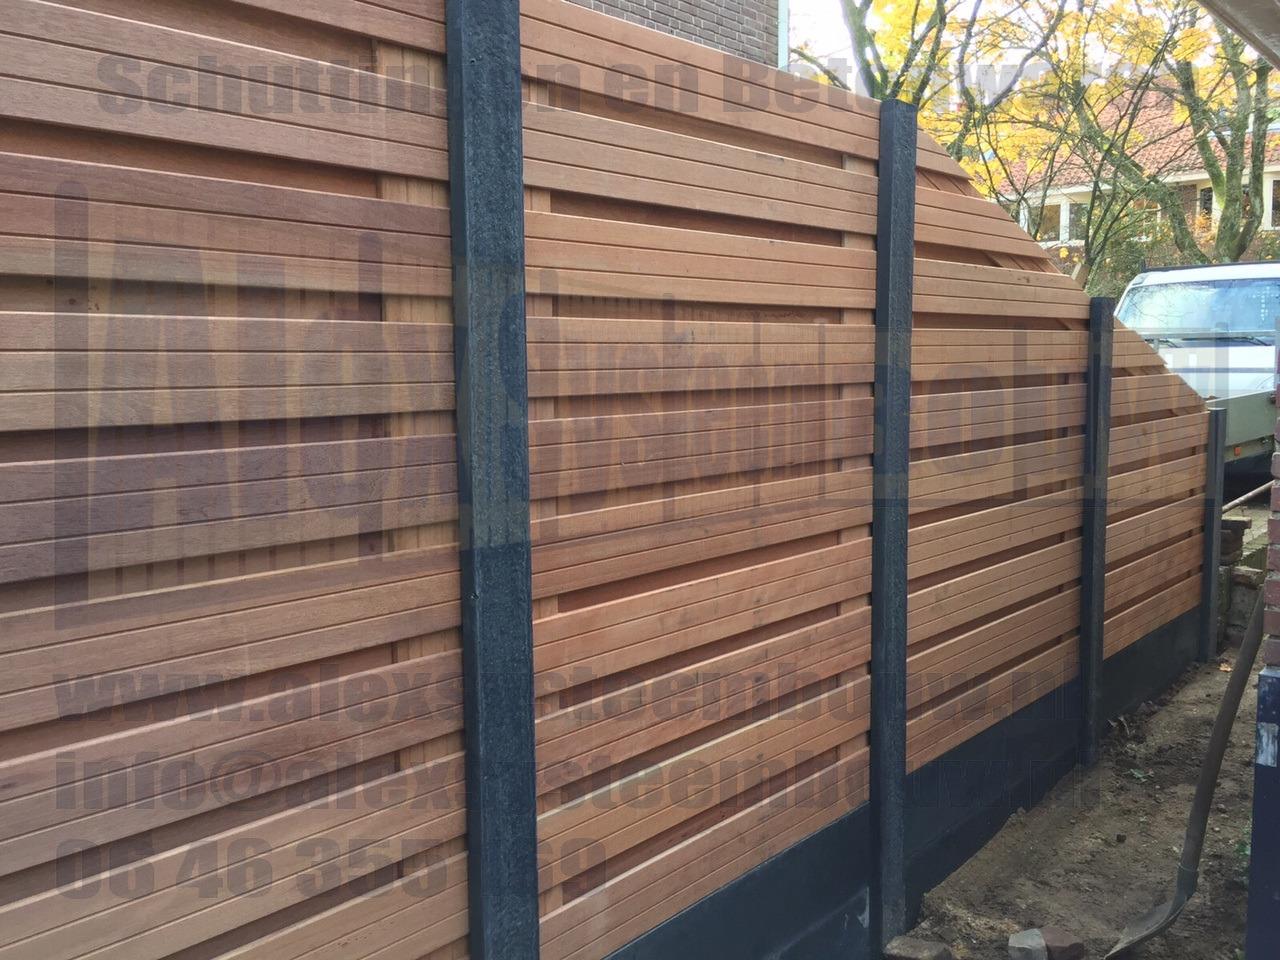 hard-houten-tuinschermen-21-planks-horizontaal